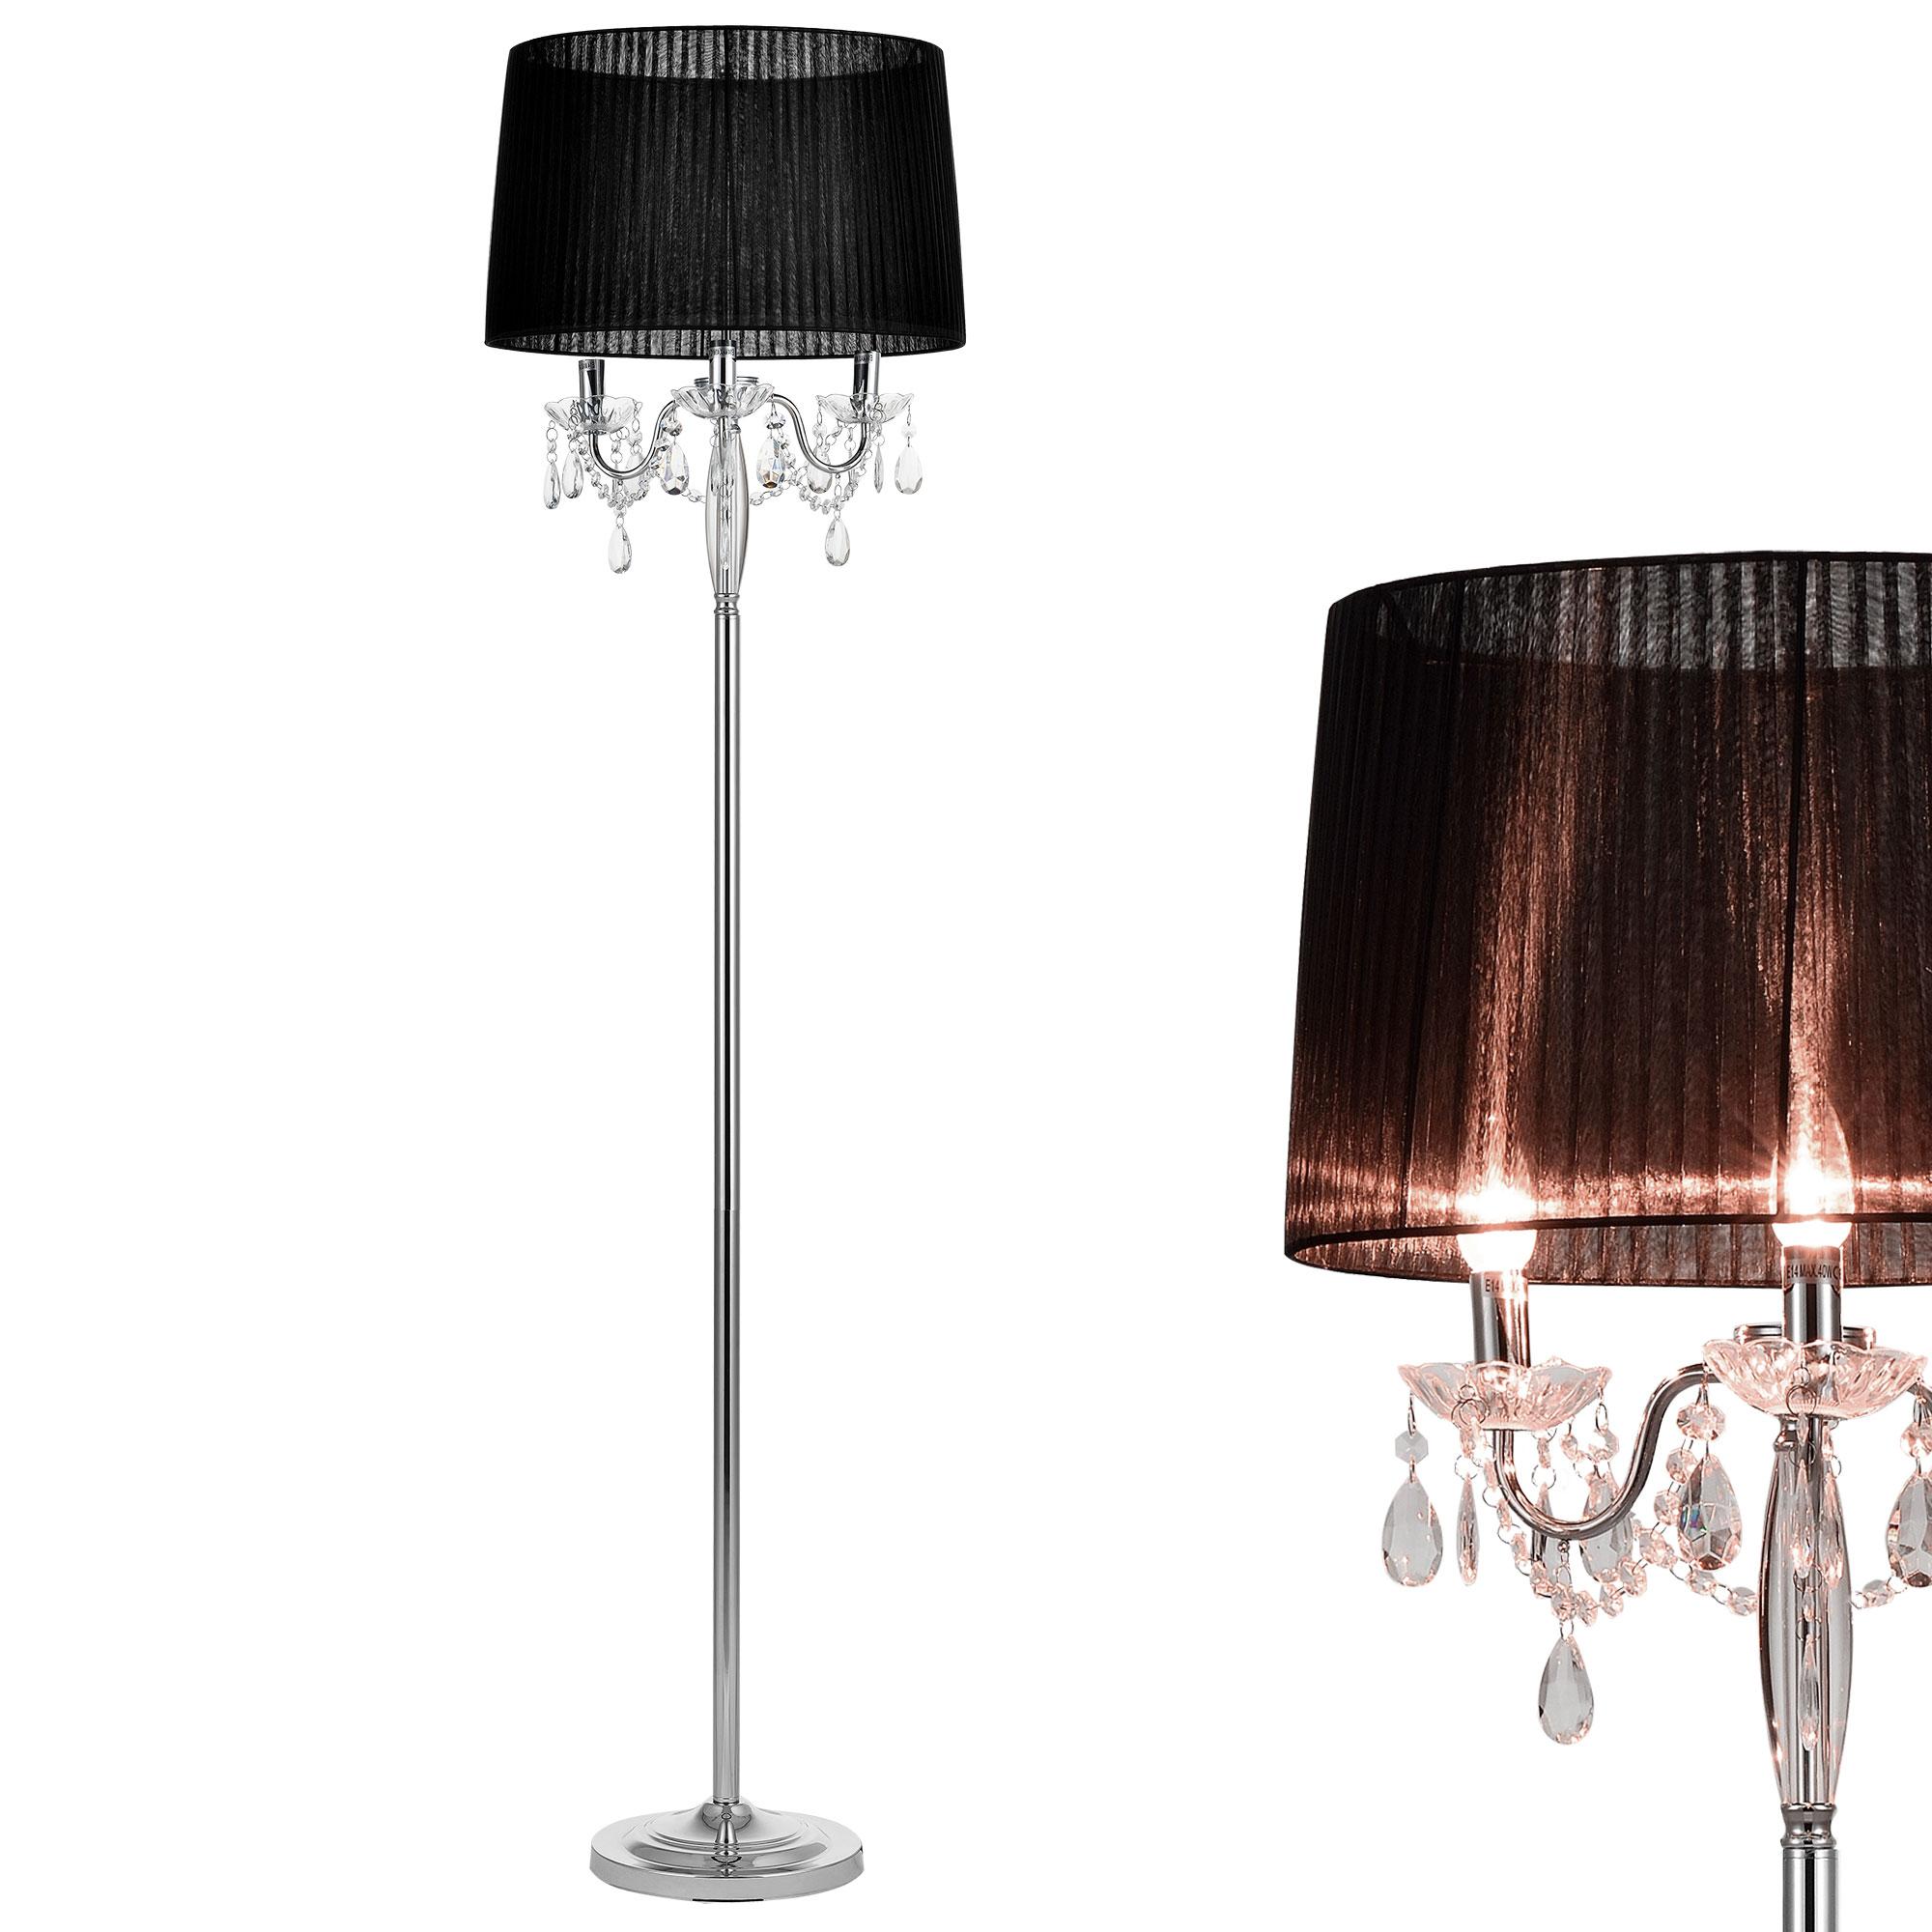 Edel stehleuchte stehlampe lampe wohnzimmerlampe leuchte edel stehleuchte stehlampe lampe wohnzimmerlampe leuchte standleuchte kristall parisarafo Gallery